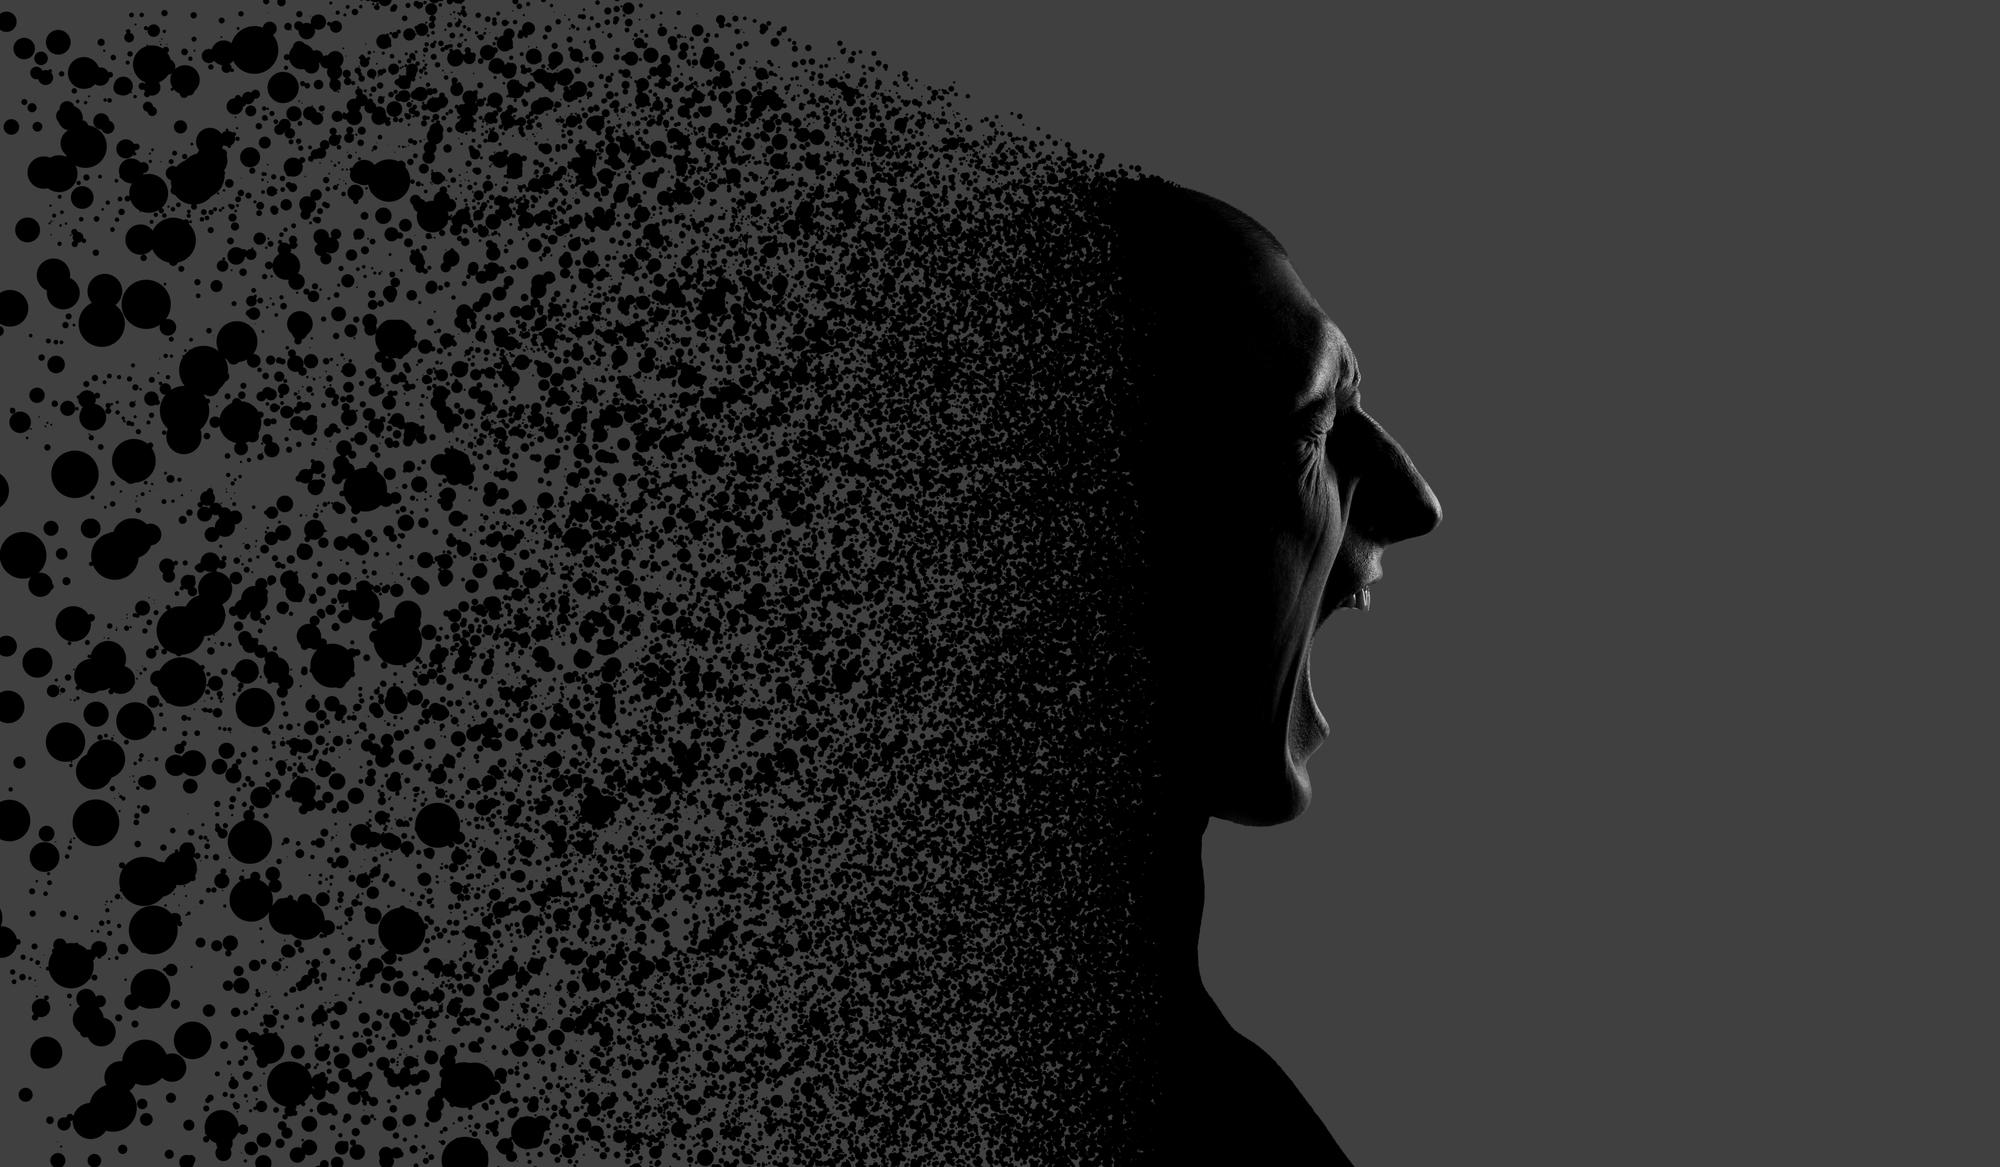 """Game-changing"" new schizophrenia drug passes Phase 2 human trials"